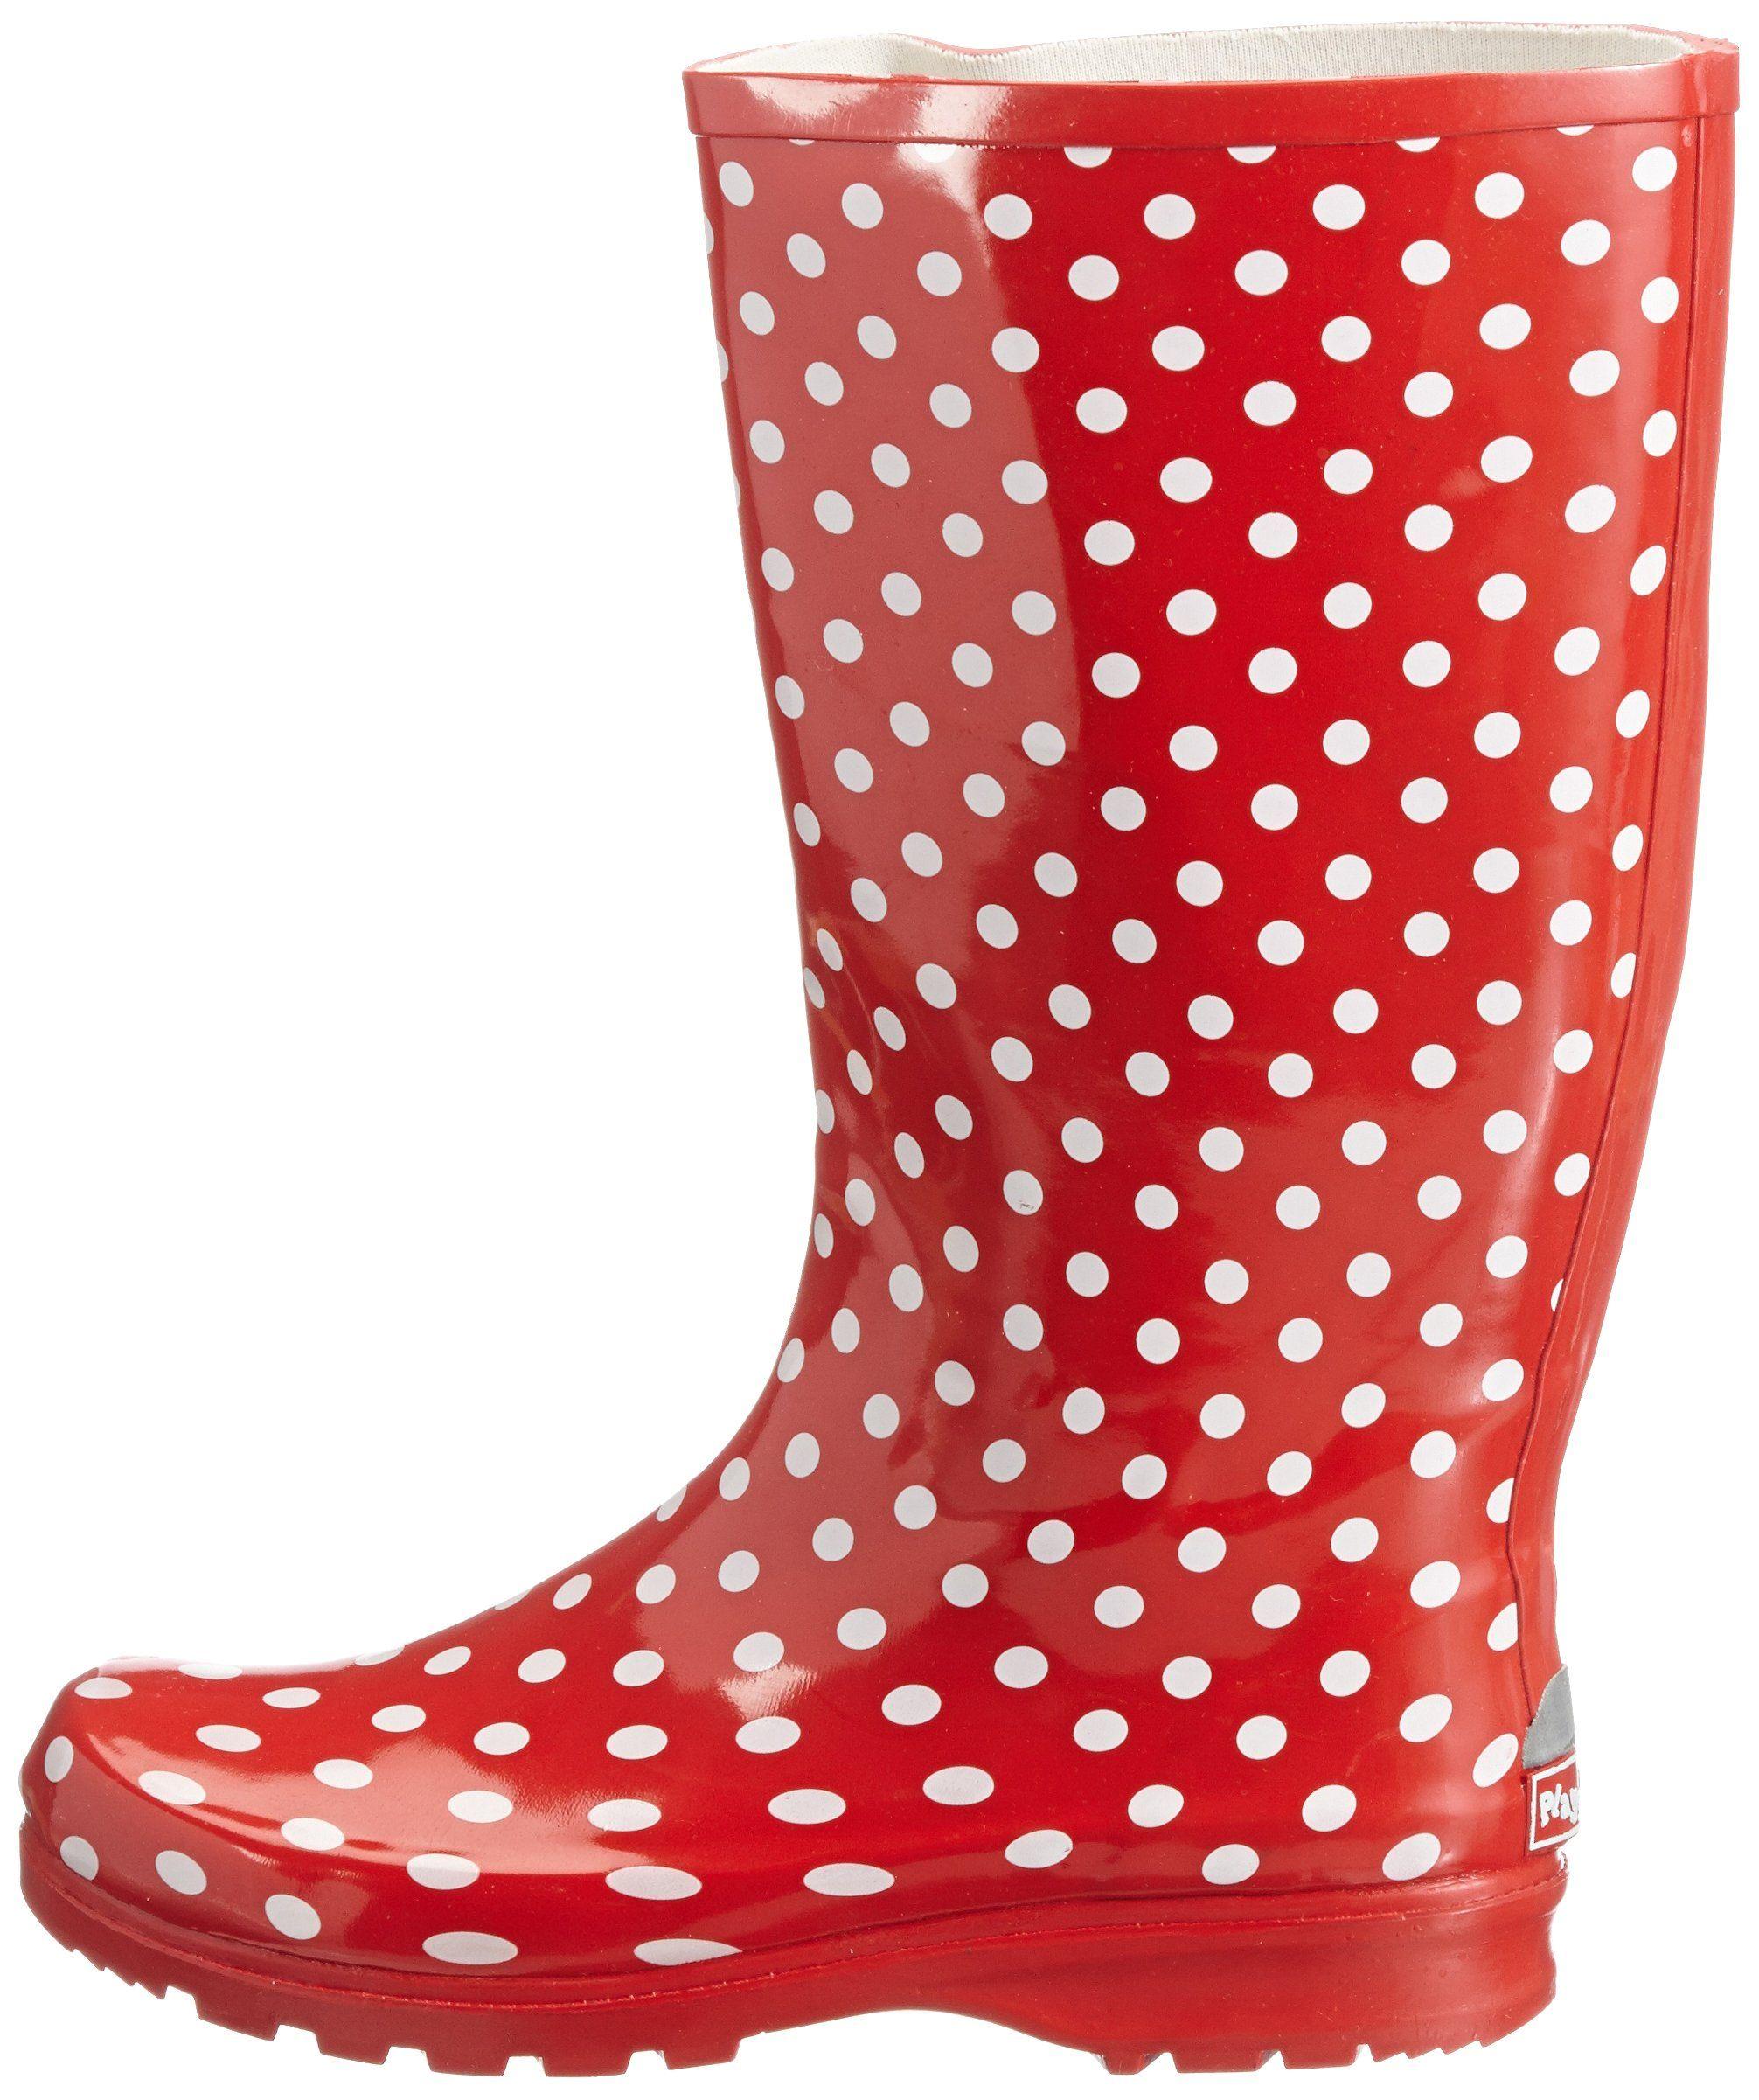 Playshoes Damen-Gummistiefel Punkte rot Gr. 42 a3bb9a